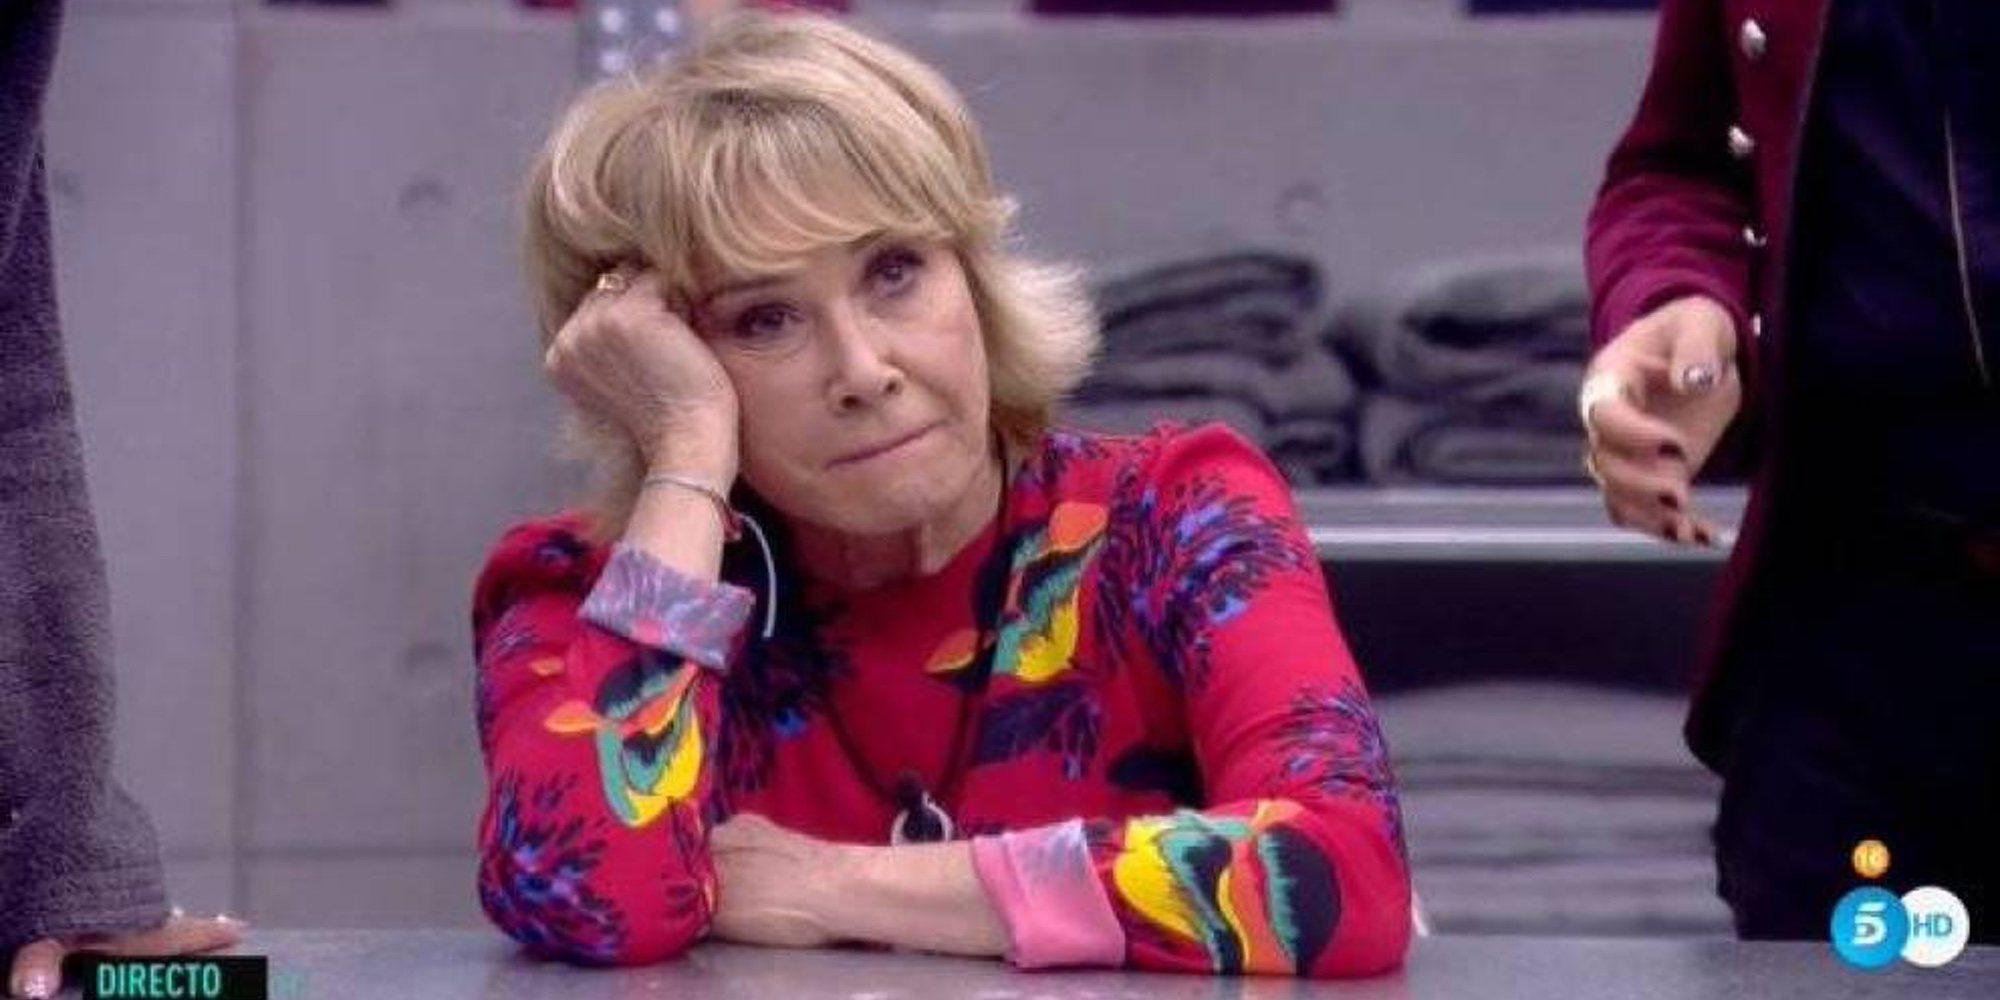 Mila Ximénez asegura en 'GH VIP 7' que demandará a Hugo Castejón por maltrato psicológico y acoso